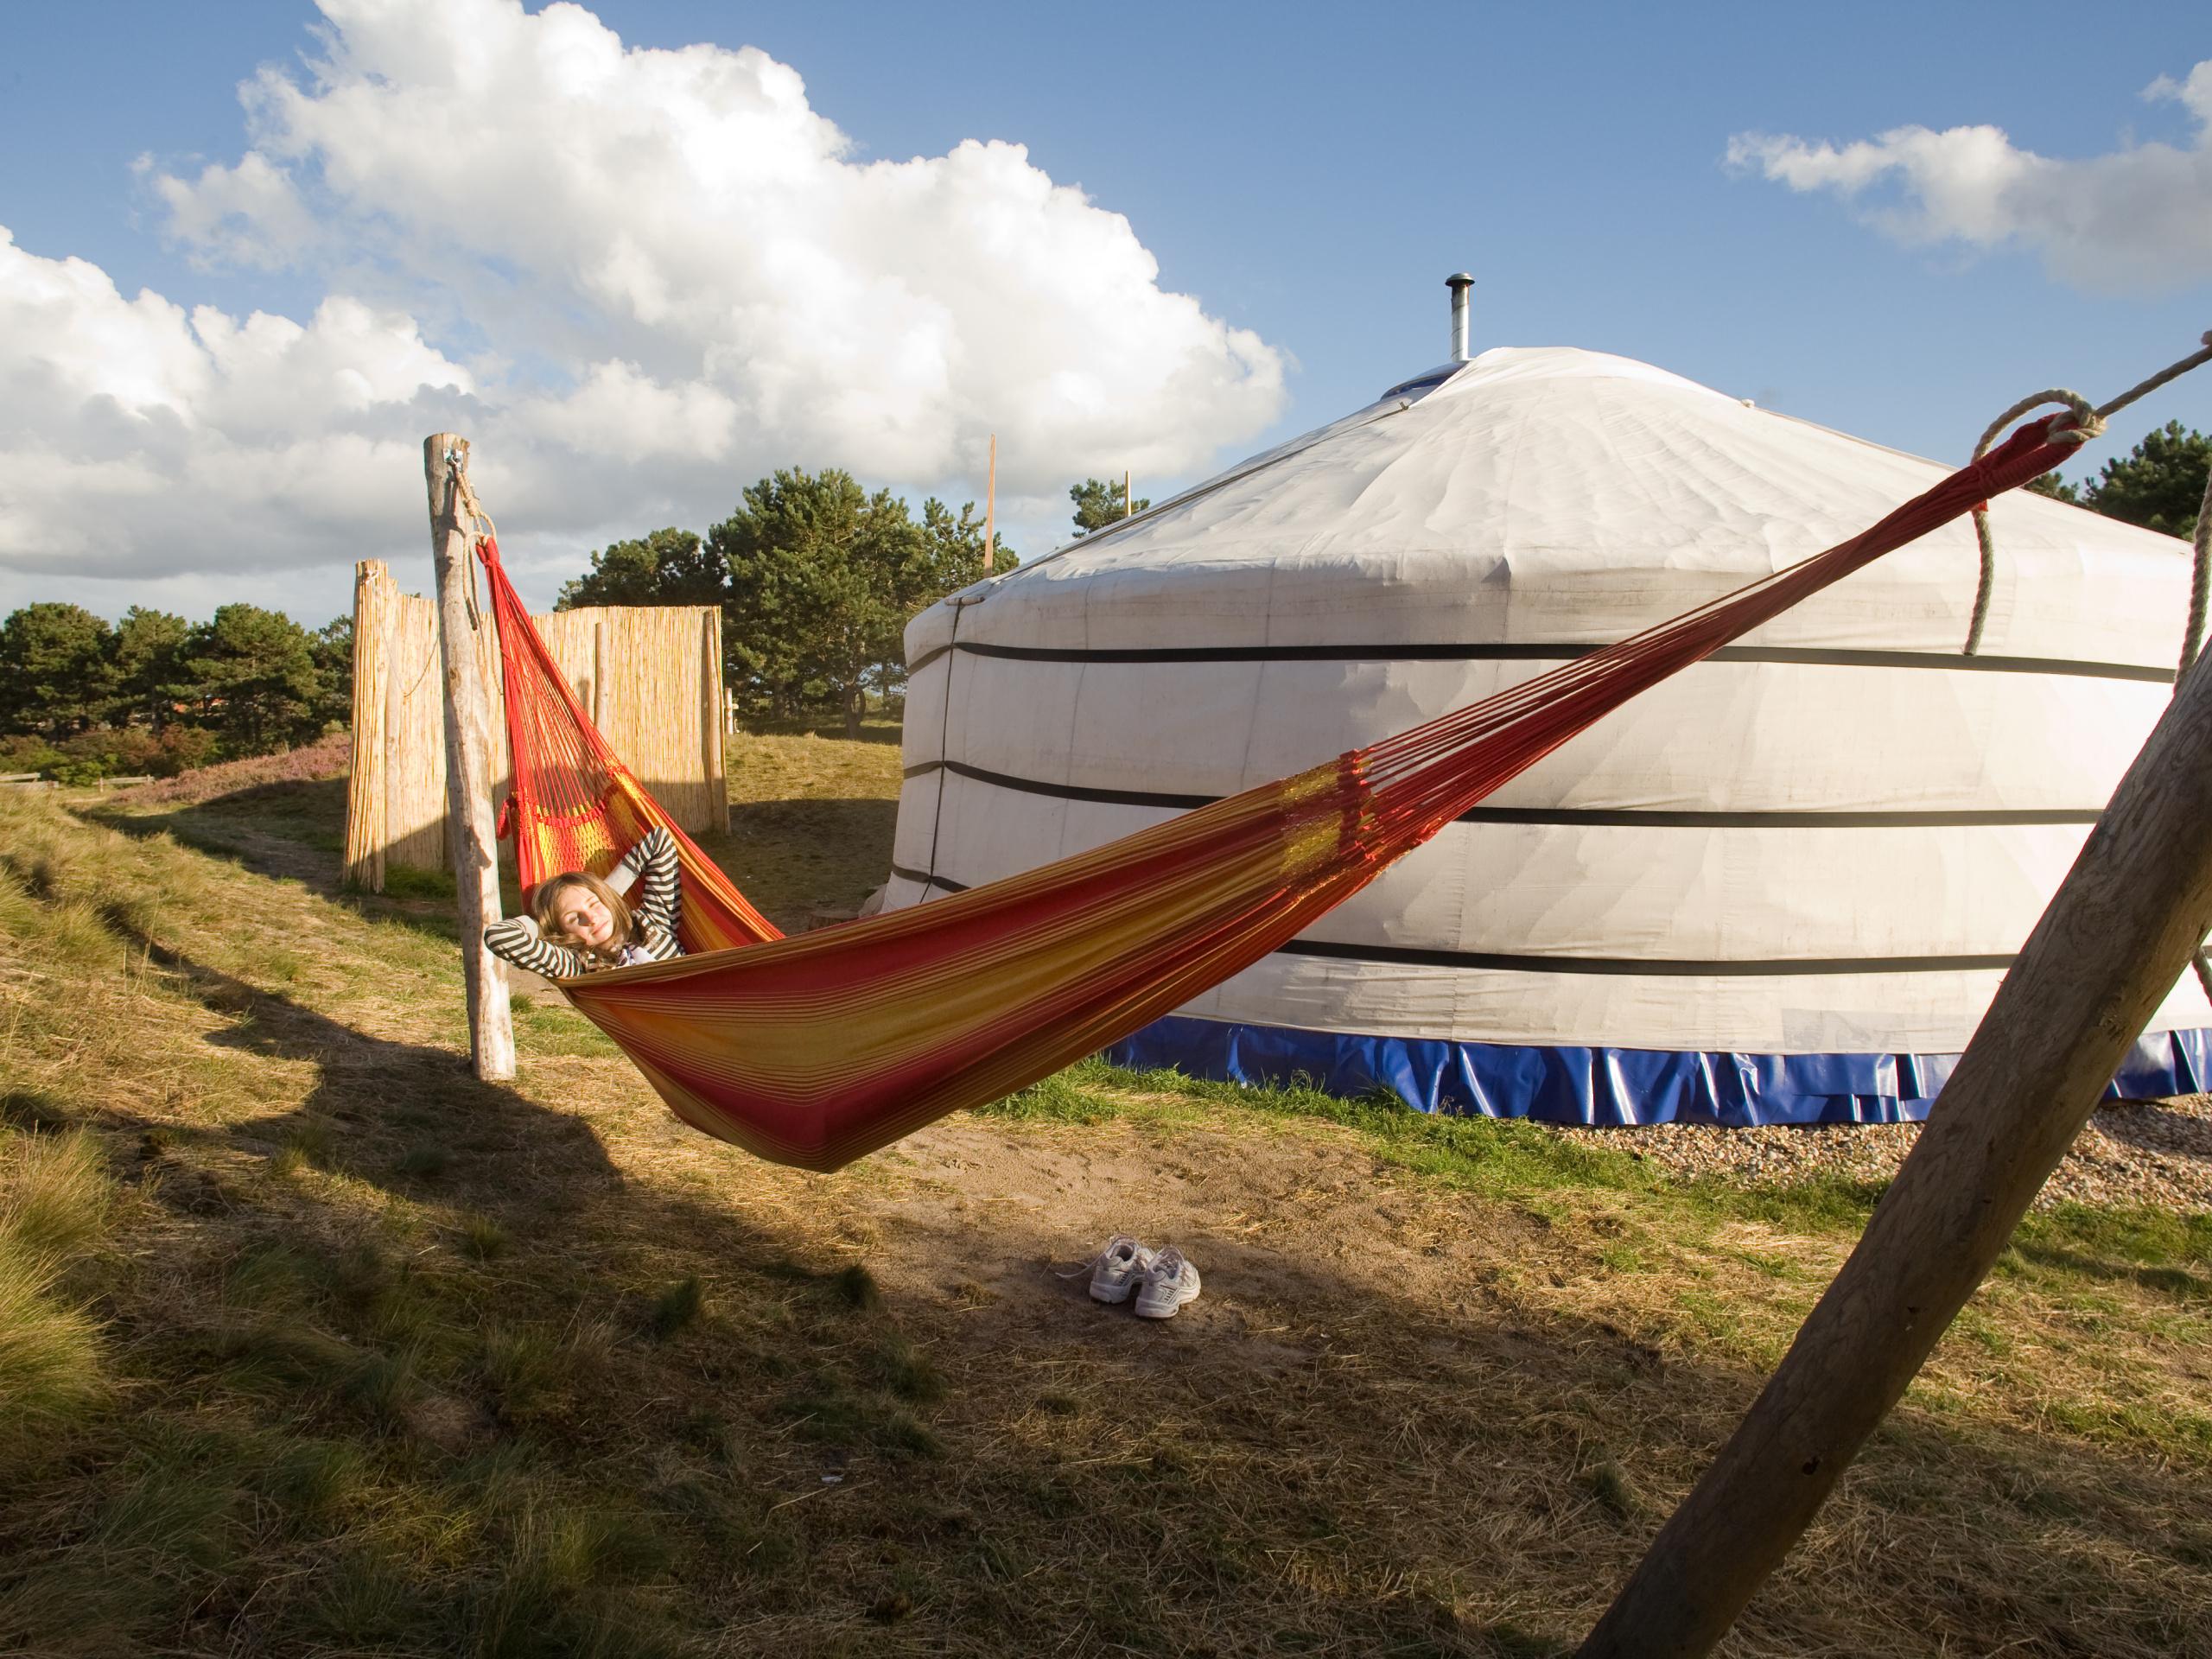 Unwind in a luxurious and charming original yurt in the dunes near Den Hoorn